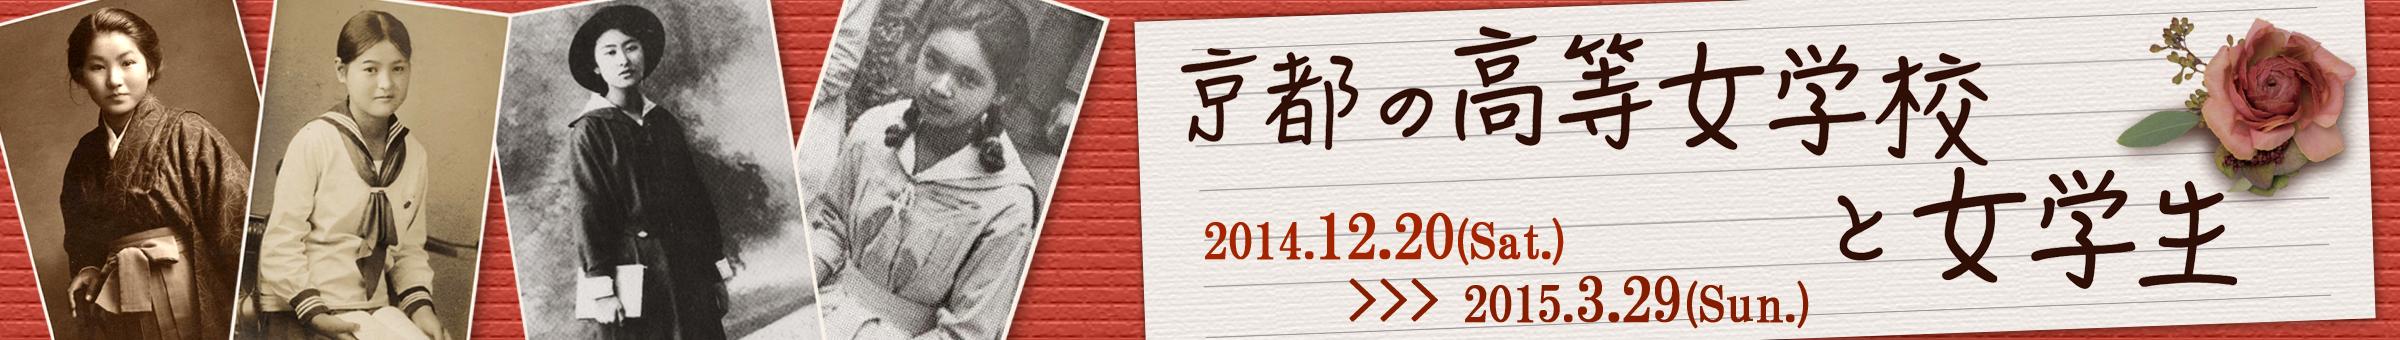 企画展「京都の高等女学校と女学生」